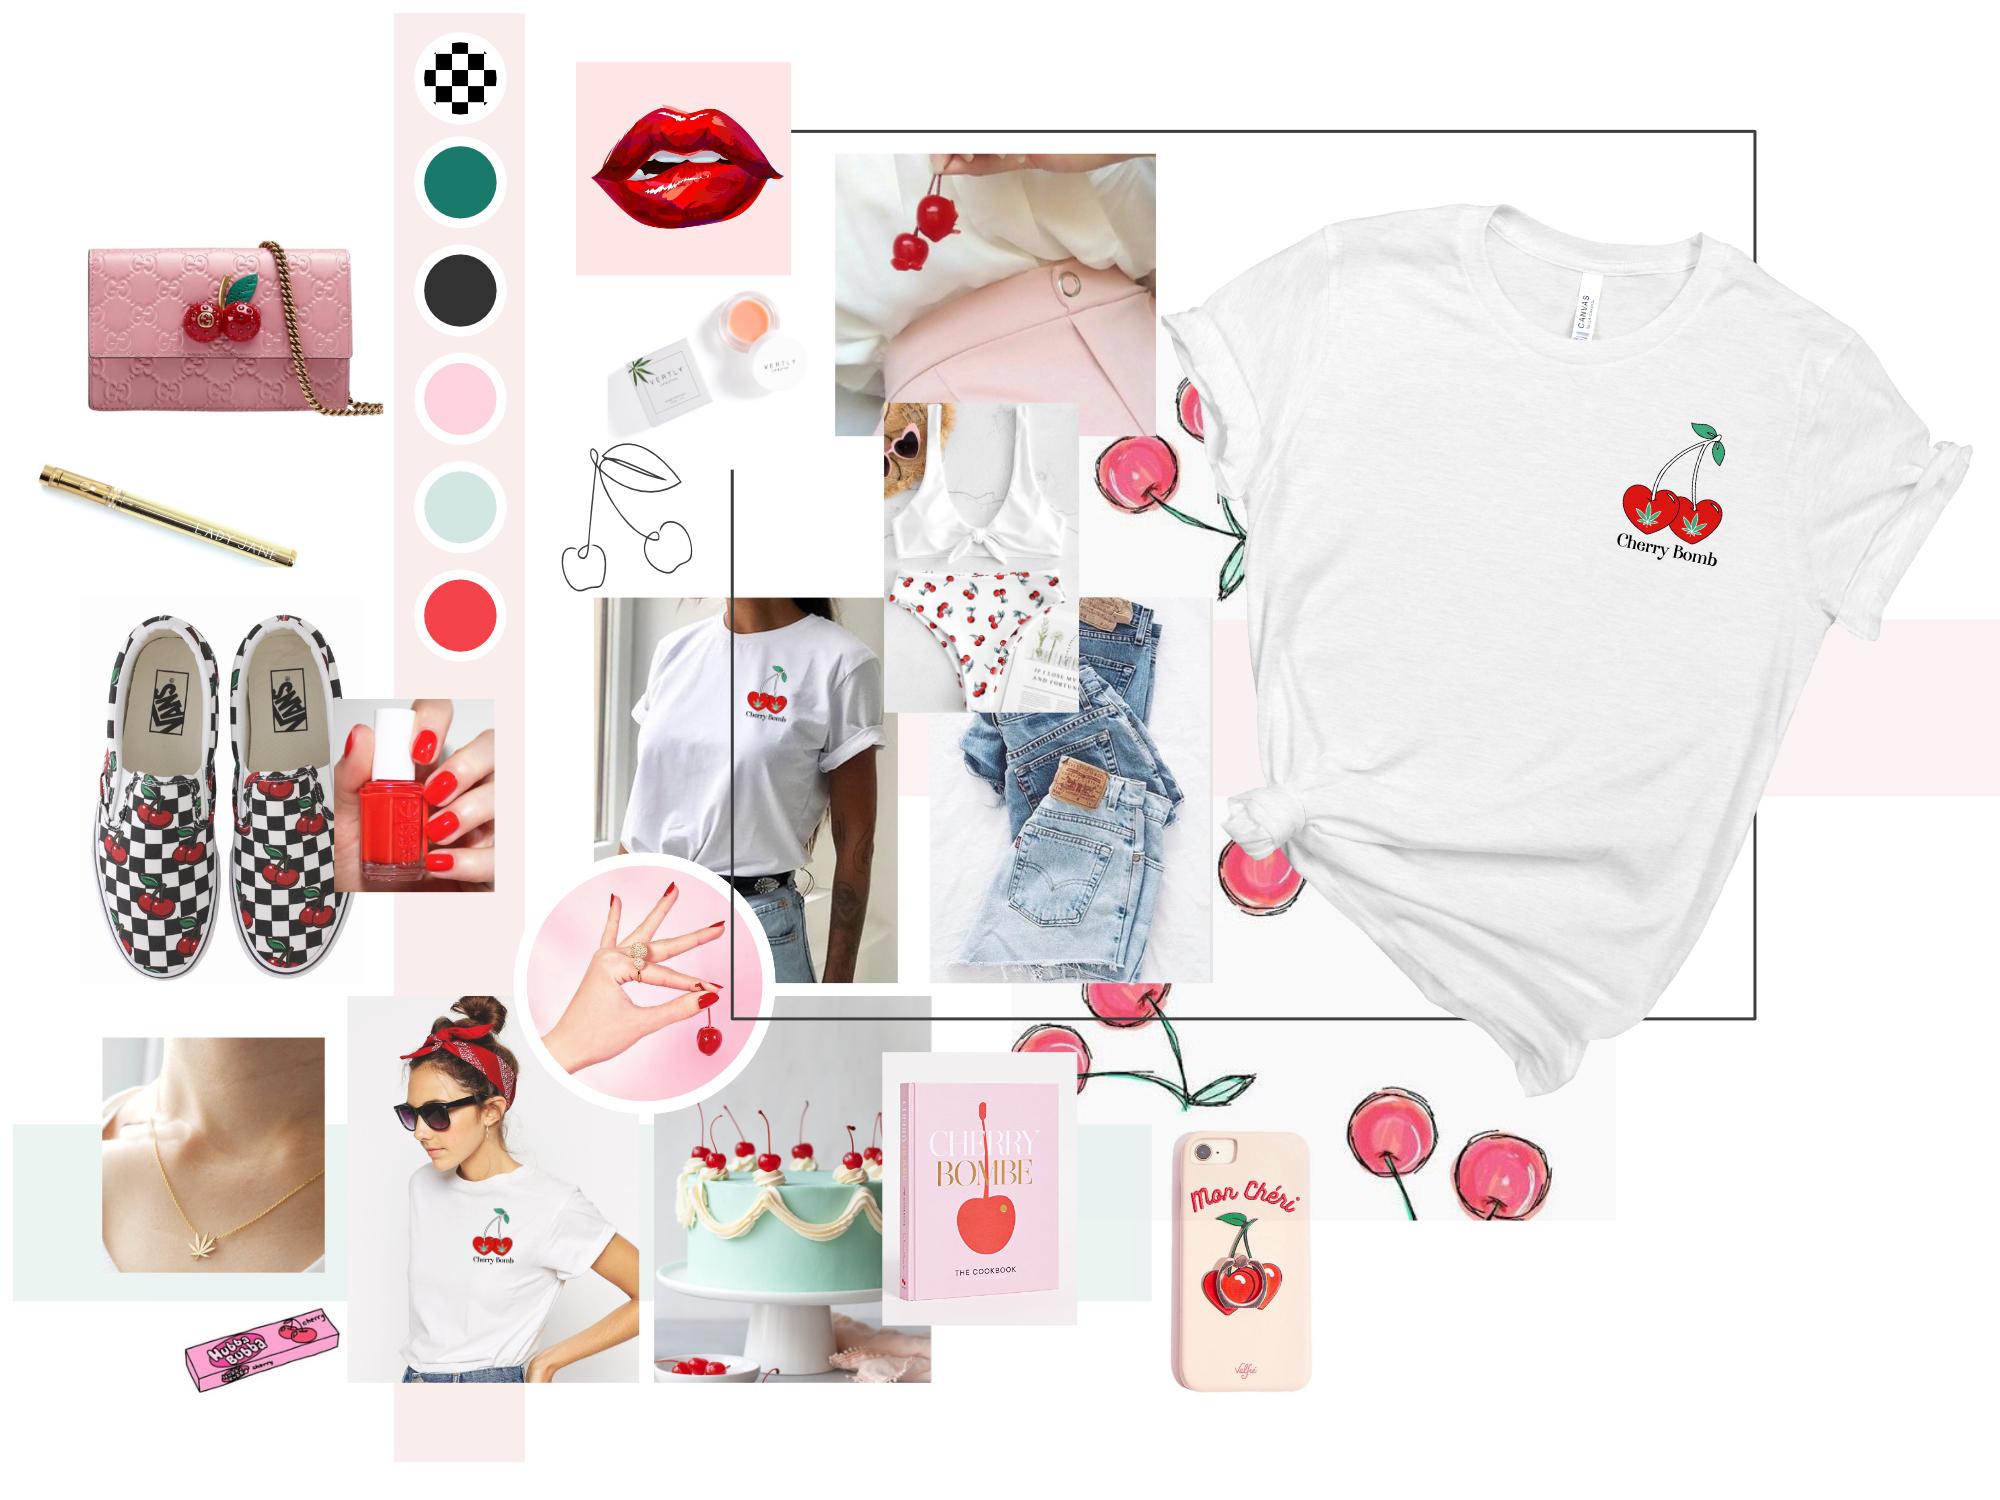 cherry bomb aesthetic edit.jpg